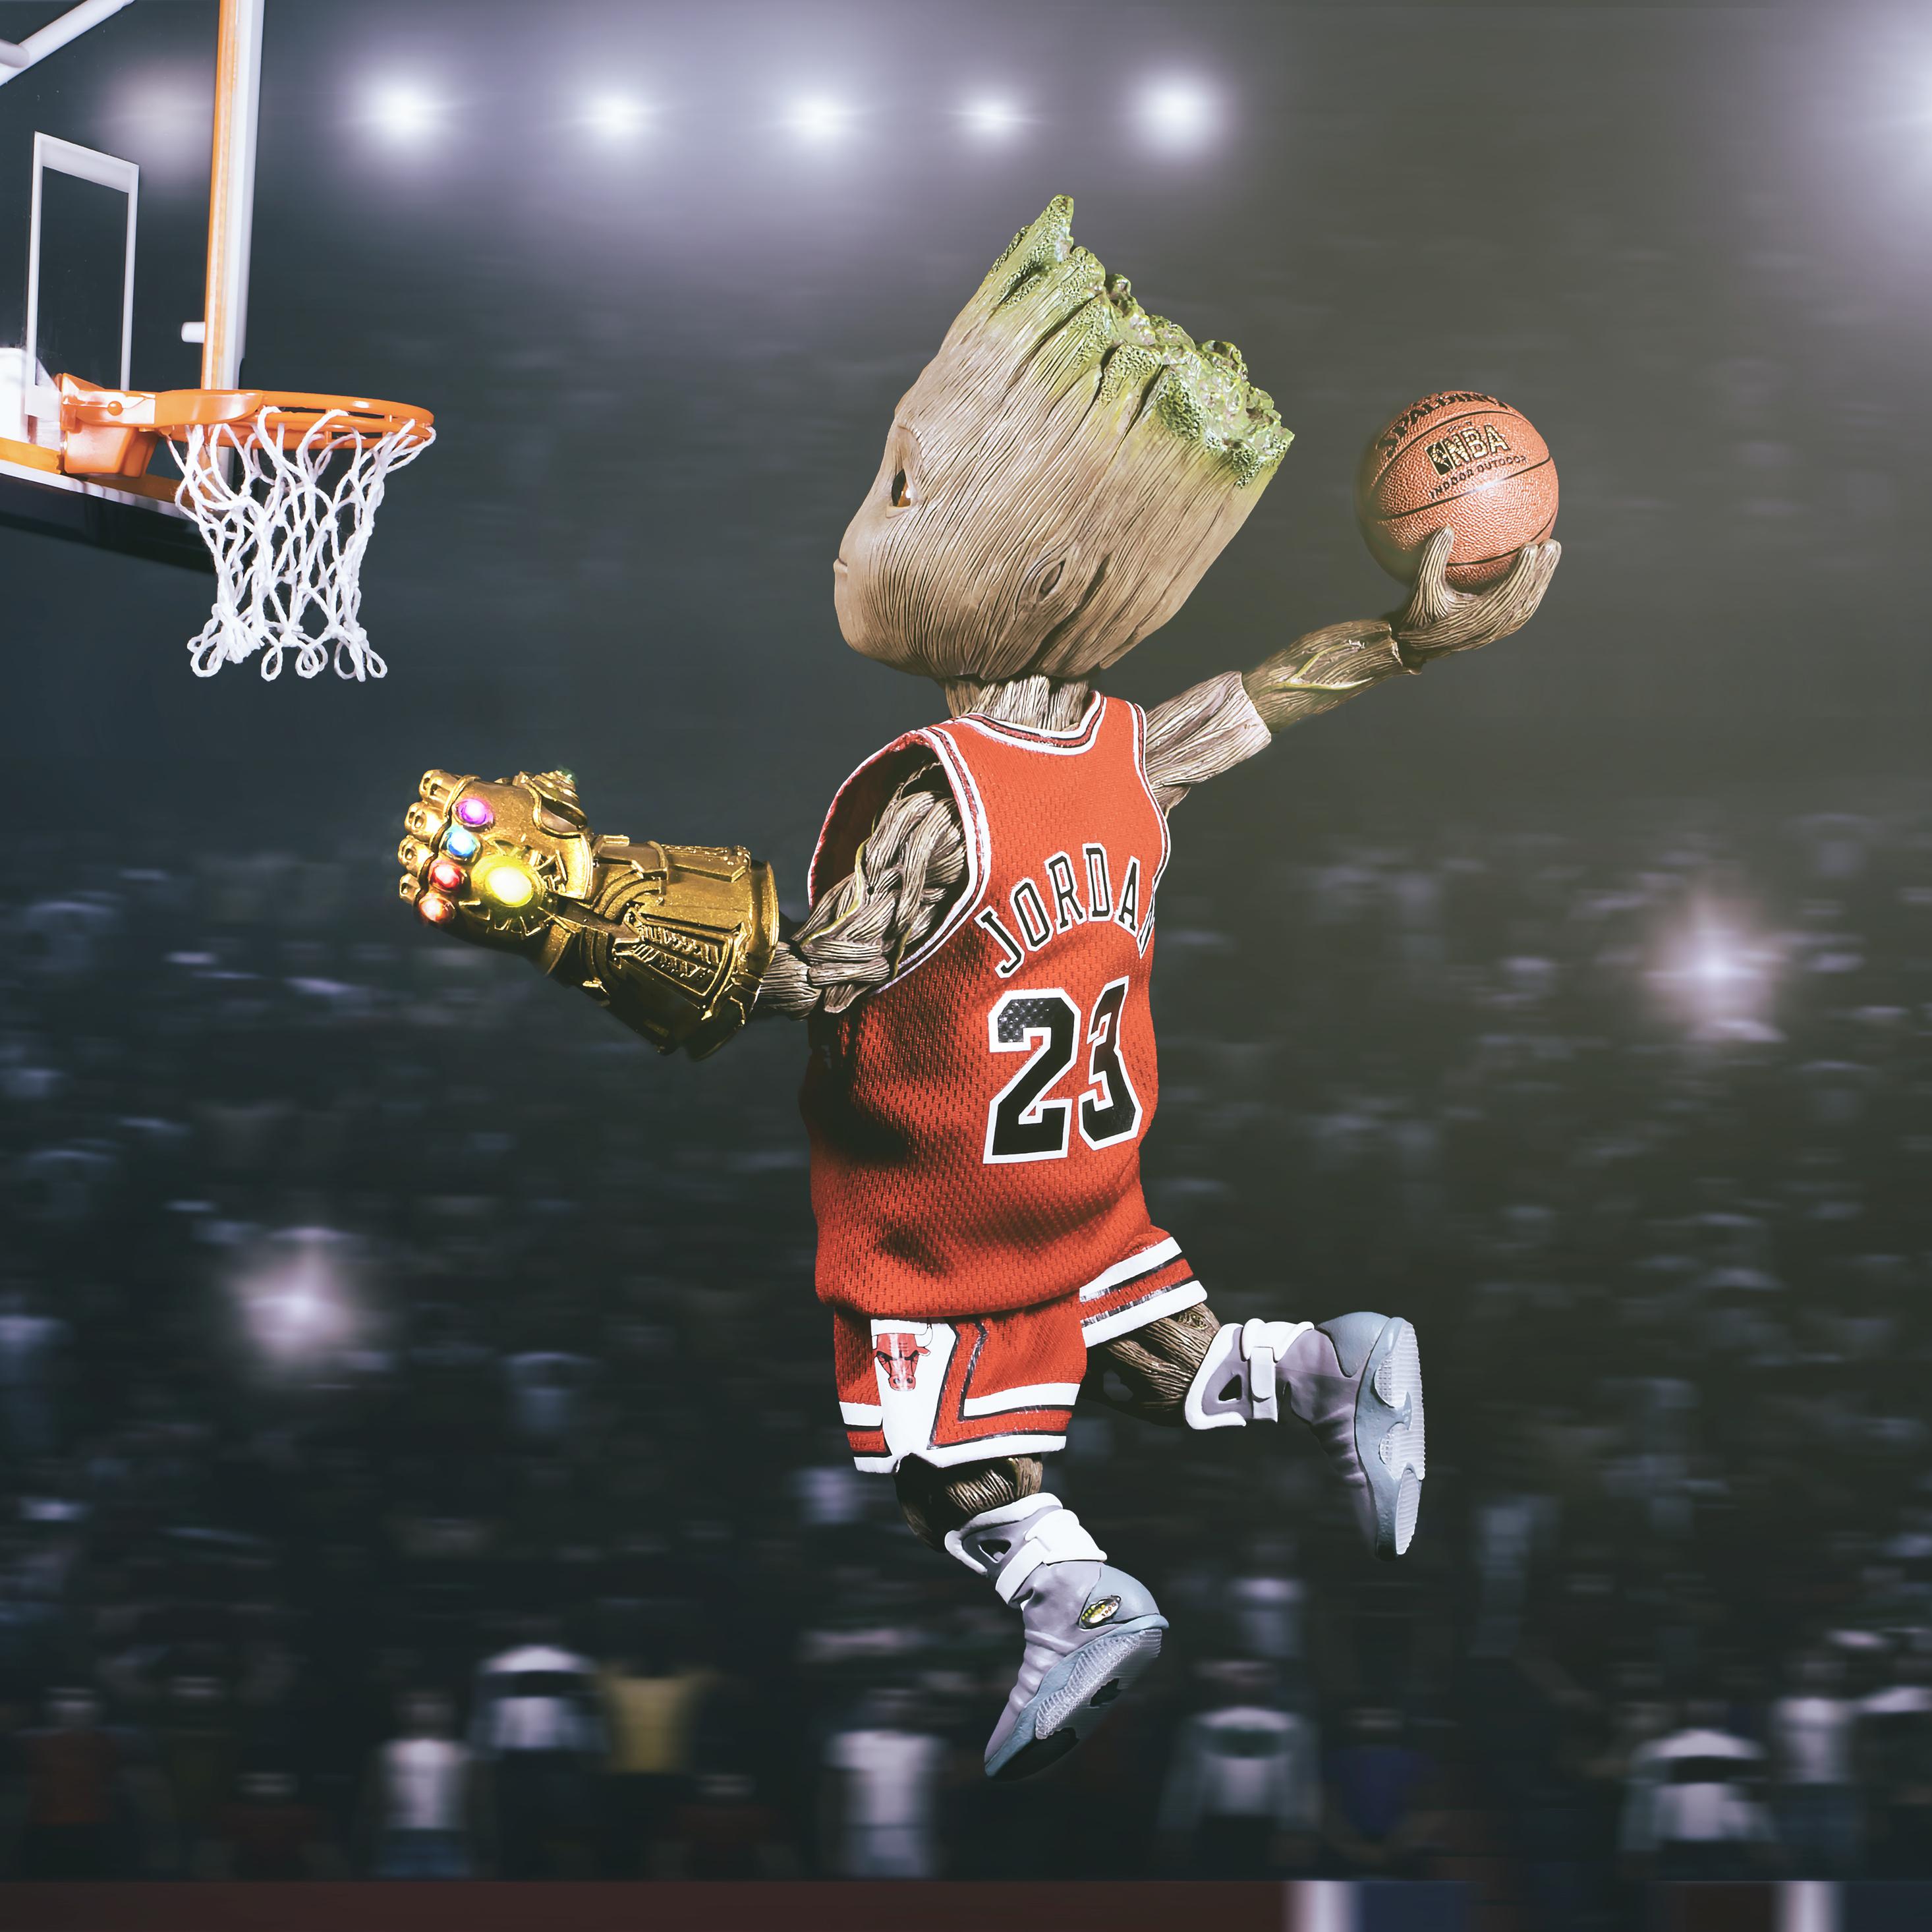 2932x2932 Baby Groot Playing Basketball Ipad Pro Retina Display Hd